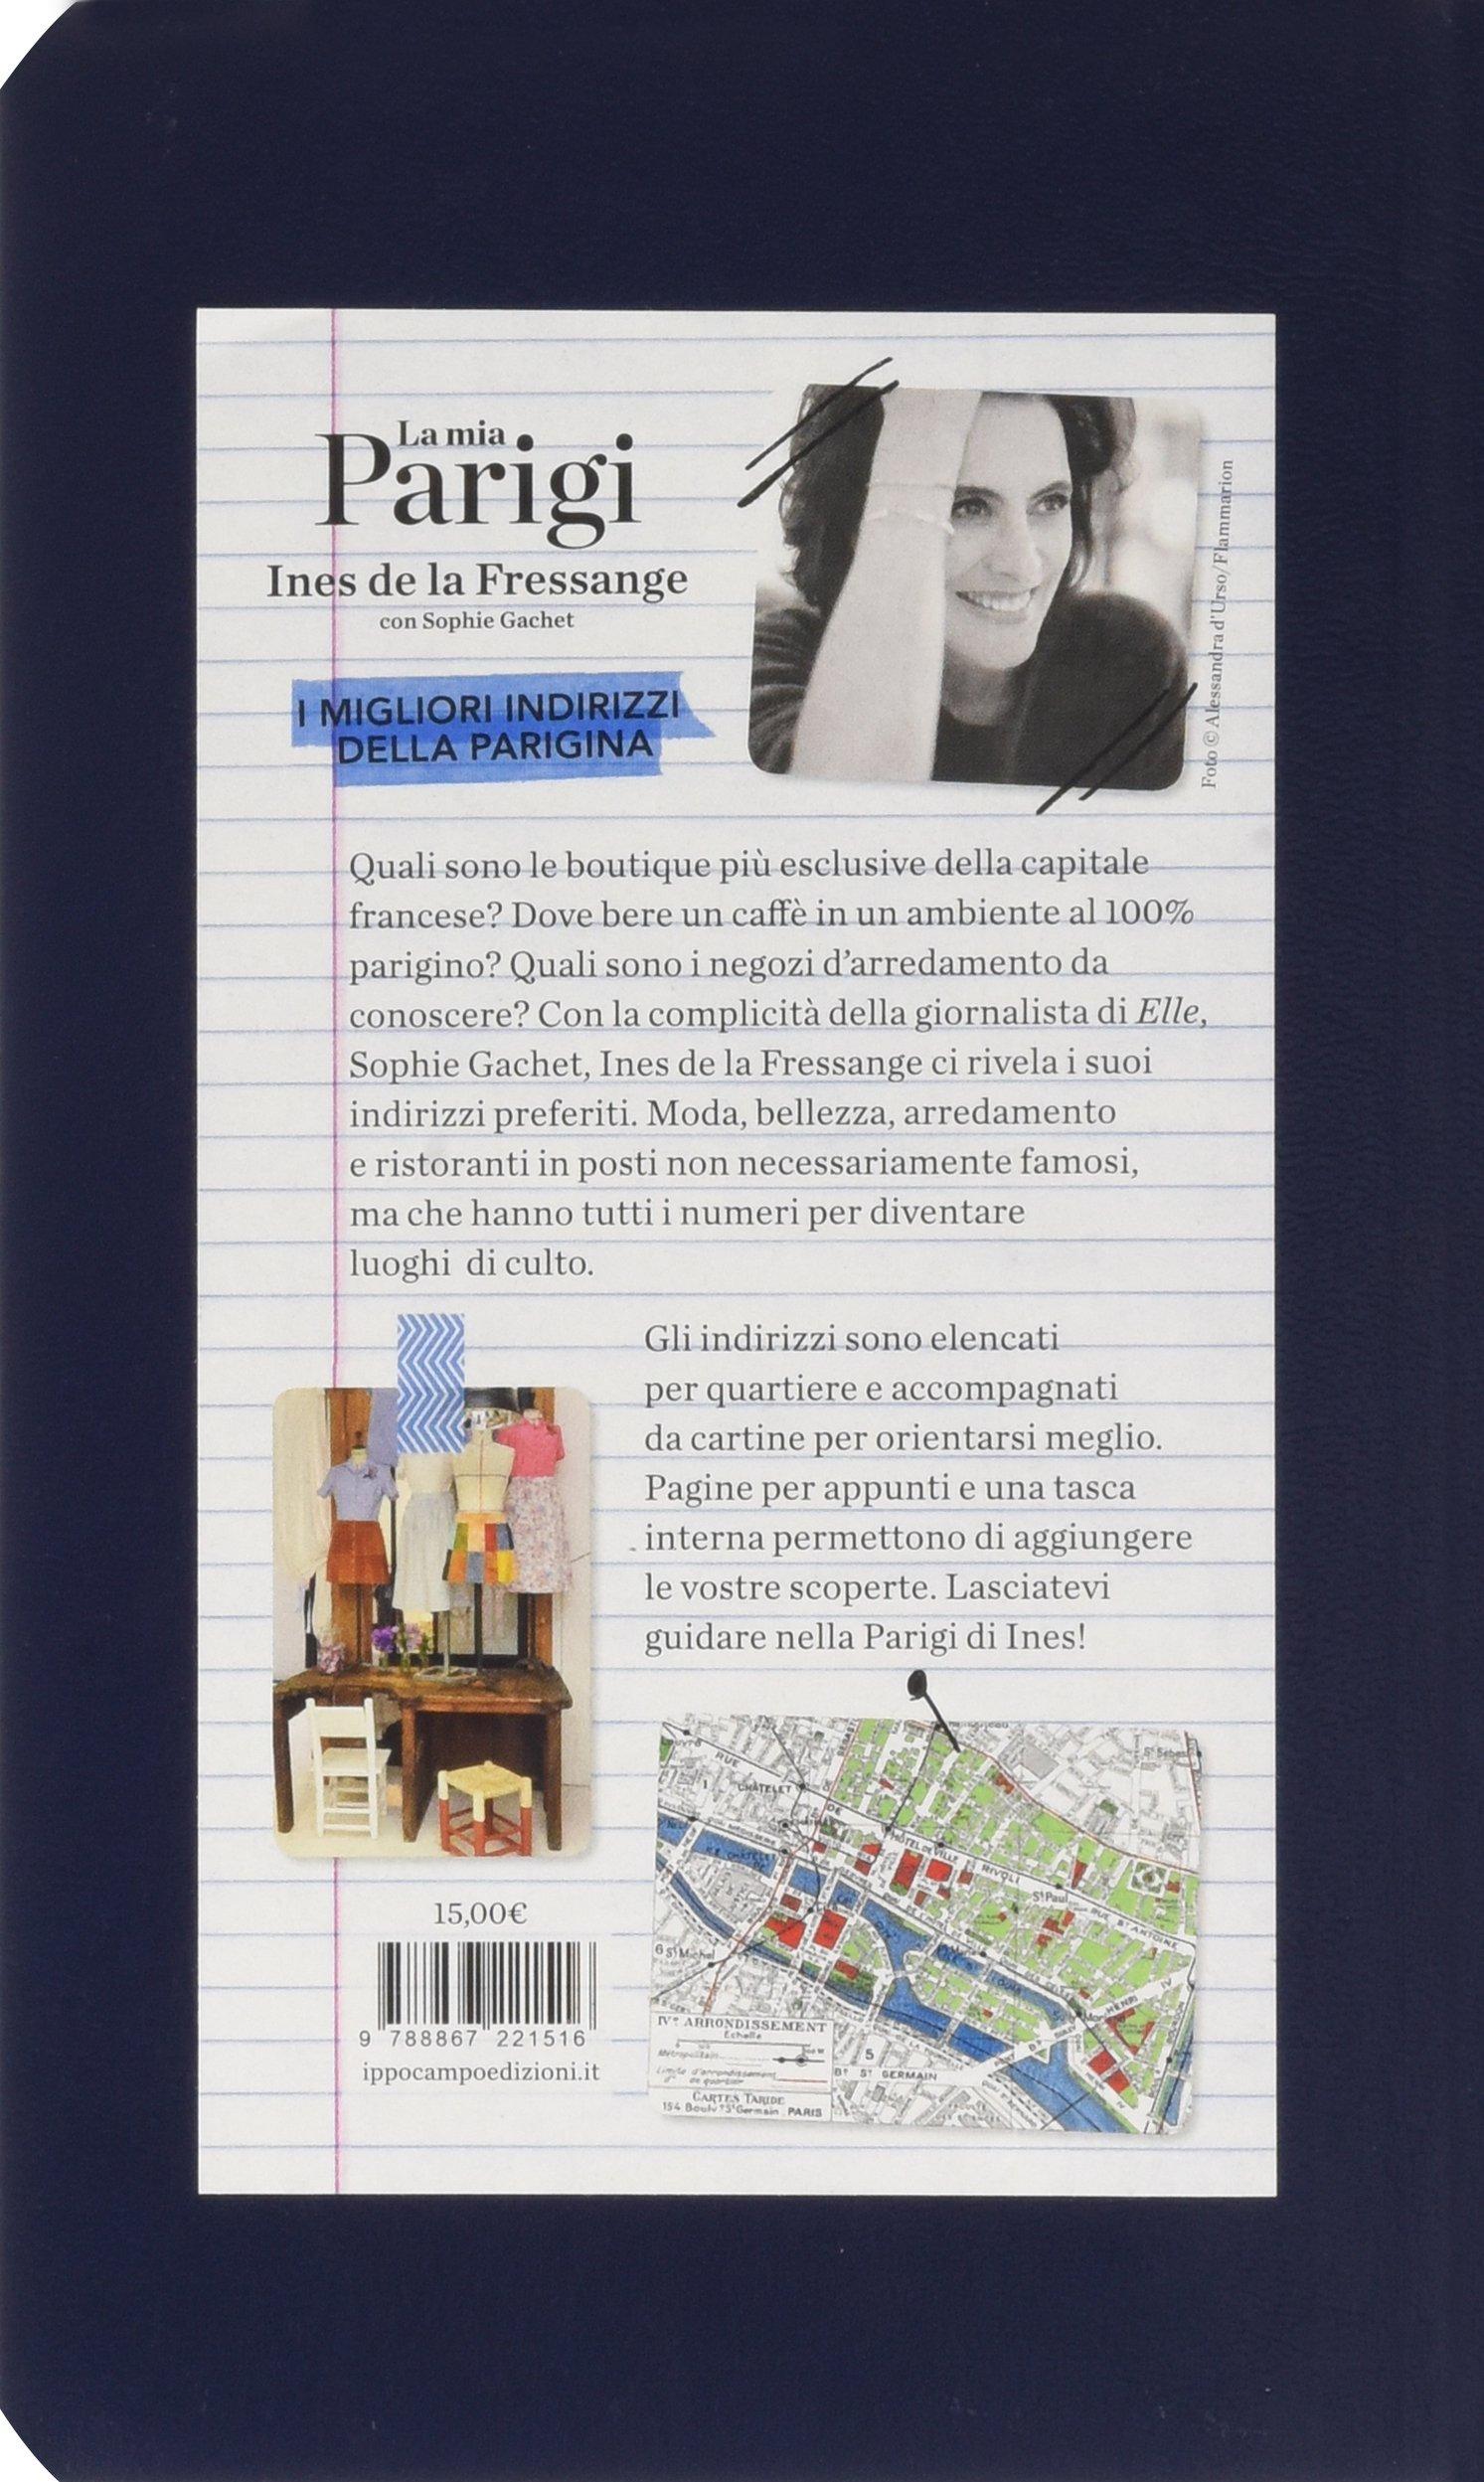 Cartina Parigi Con Quartieri.La Mia Parigi Con Cartina Gachet Sophie La Fressange Ines De 9788867221516 Amazon Com Books